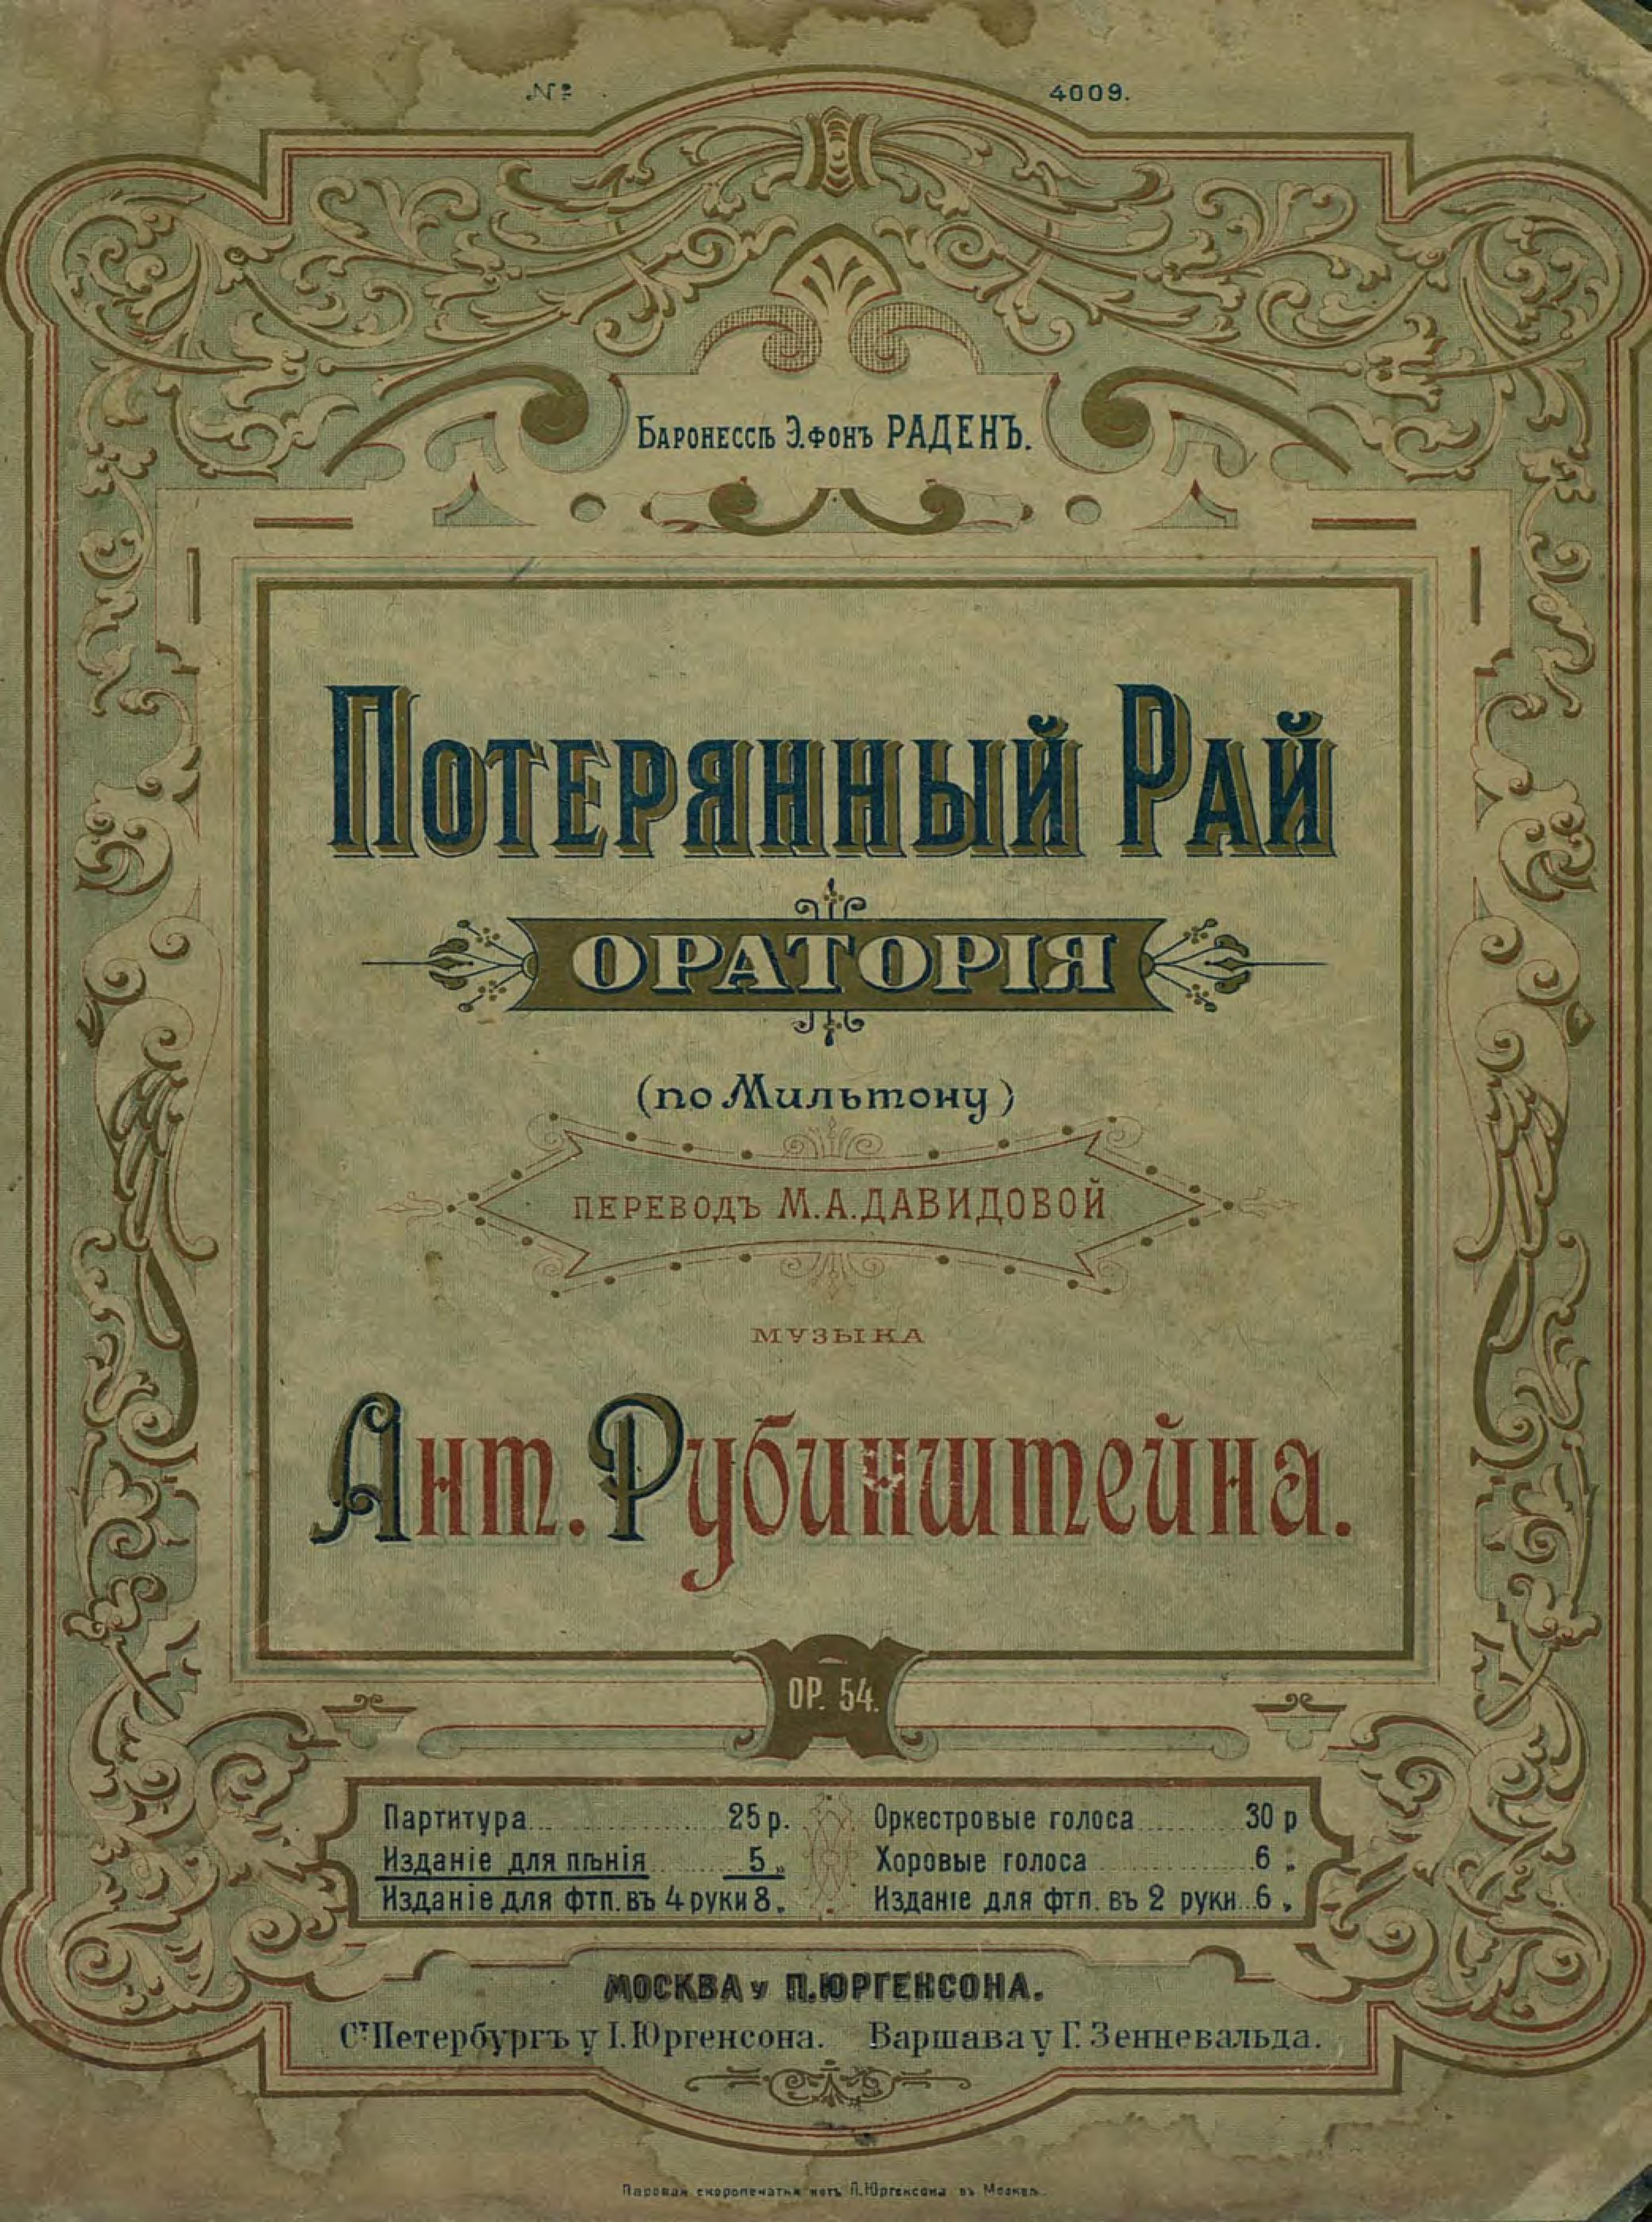 Антон Григорьевич Рубинштейн Потерянный рай андрей егоров потерянный рай